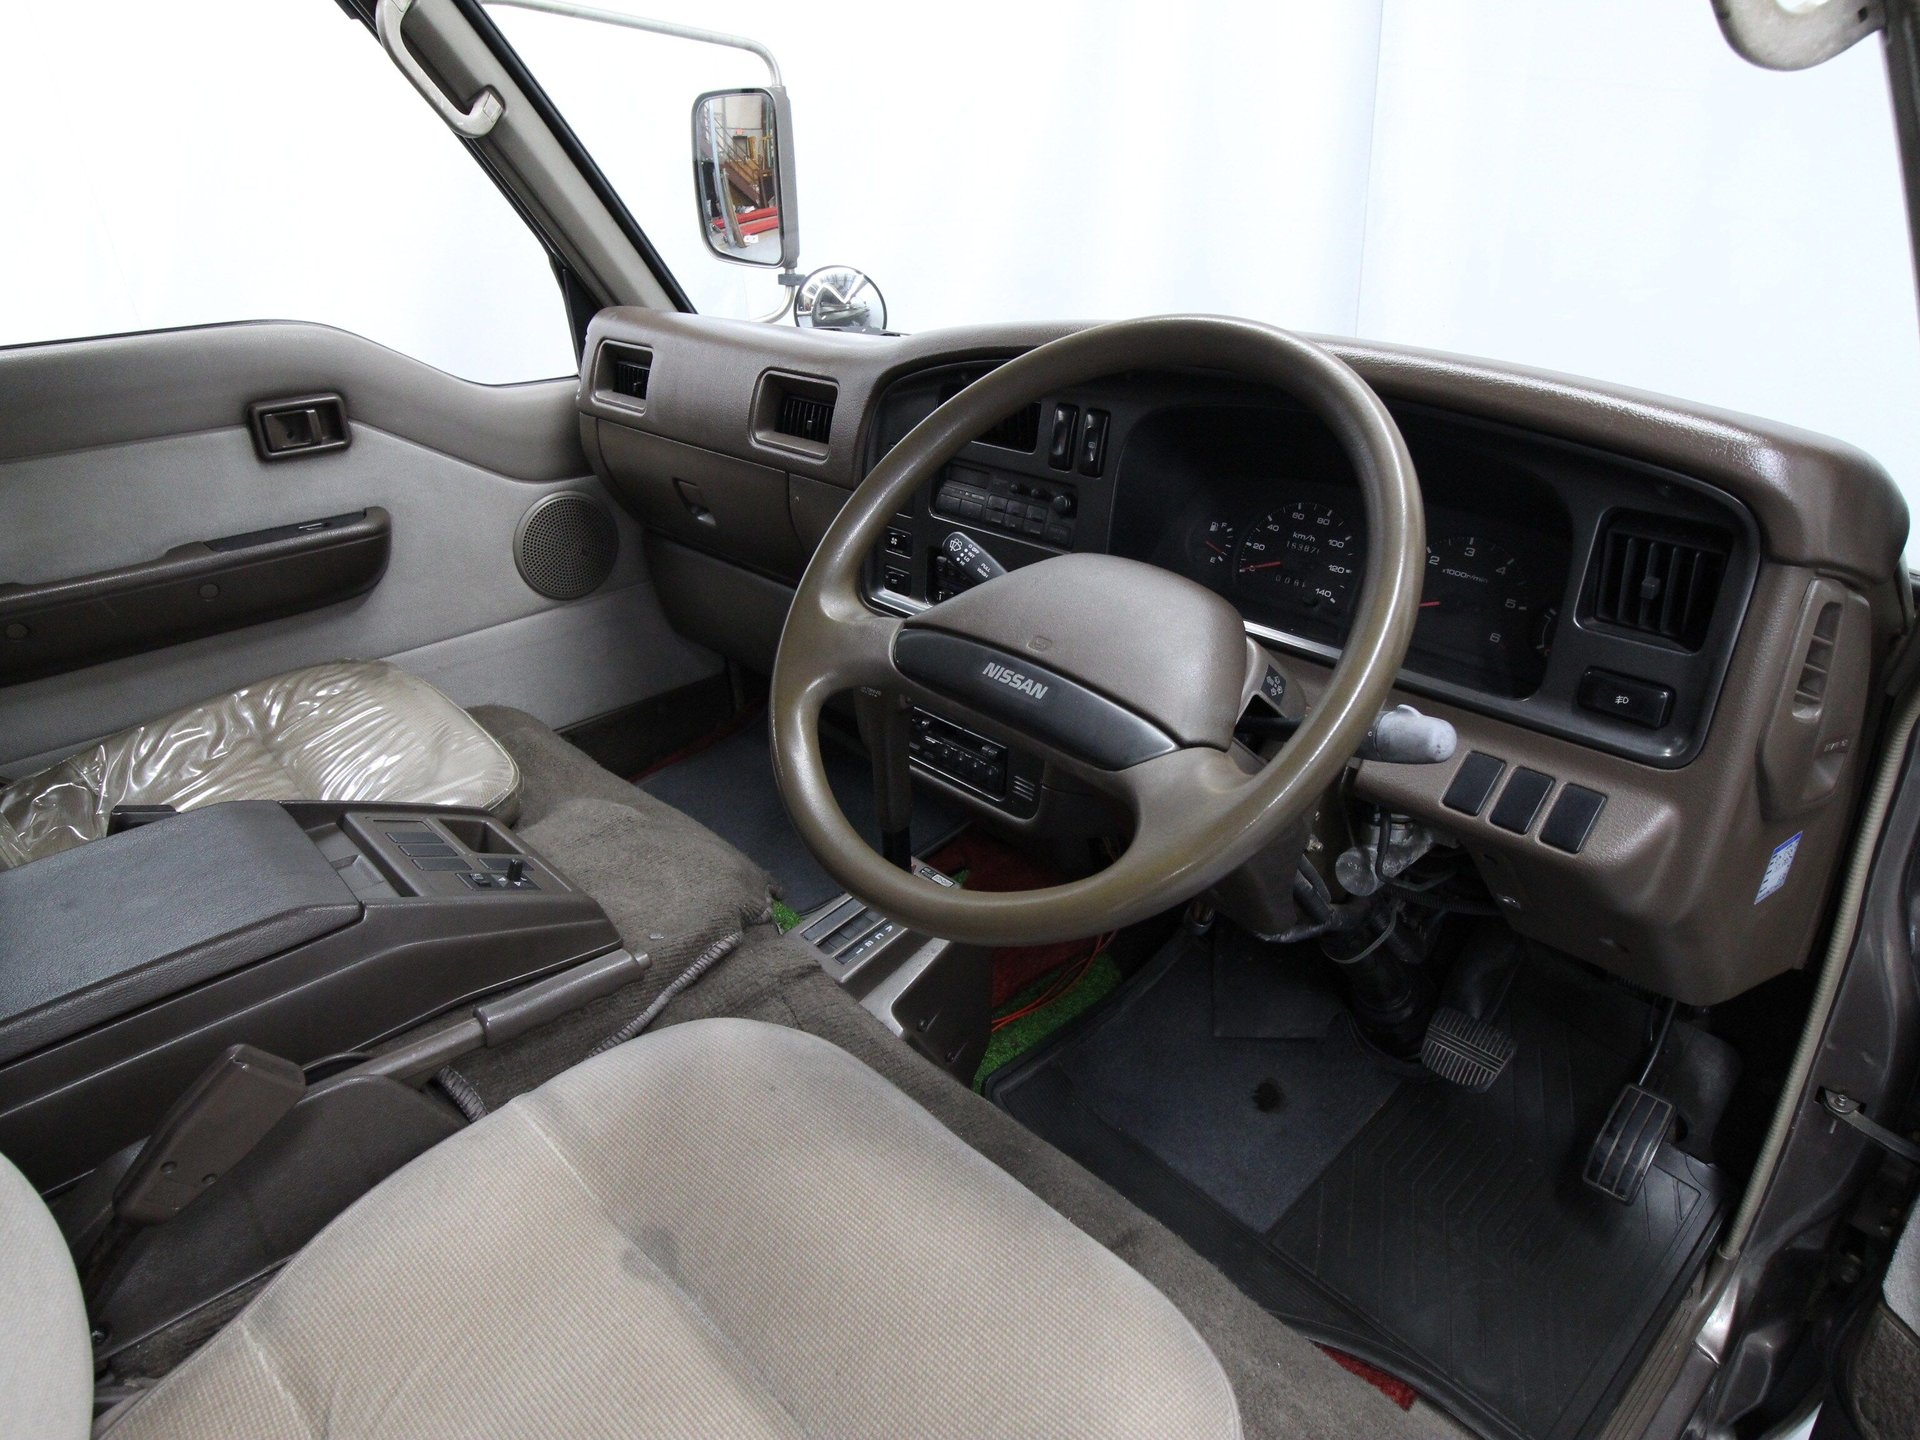 1992 Nissan Caravan